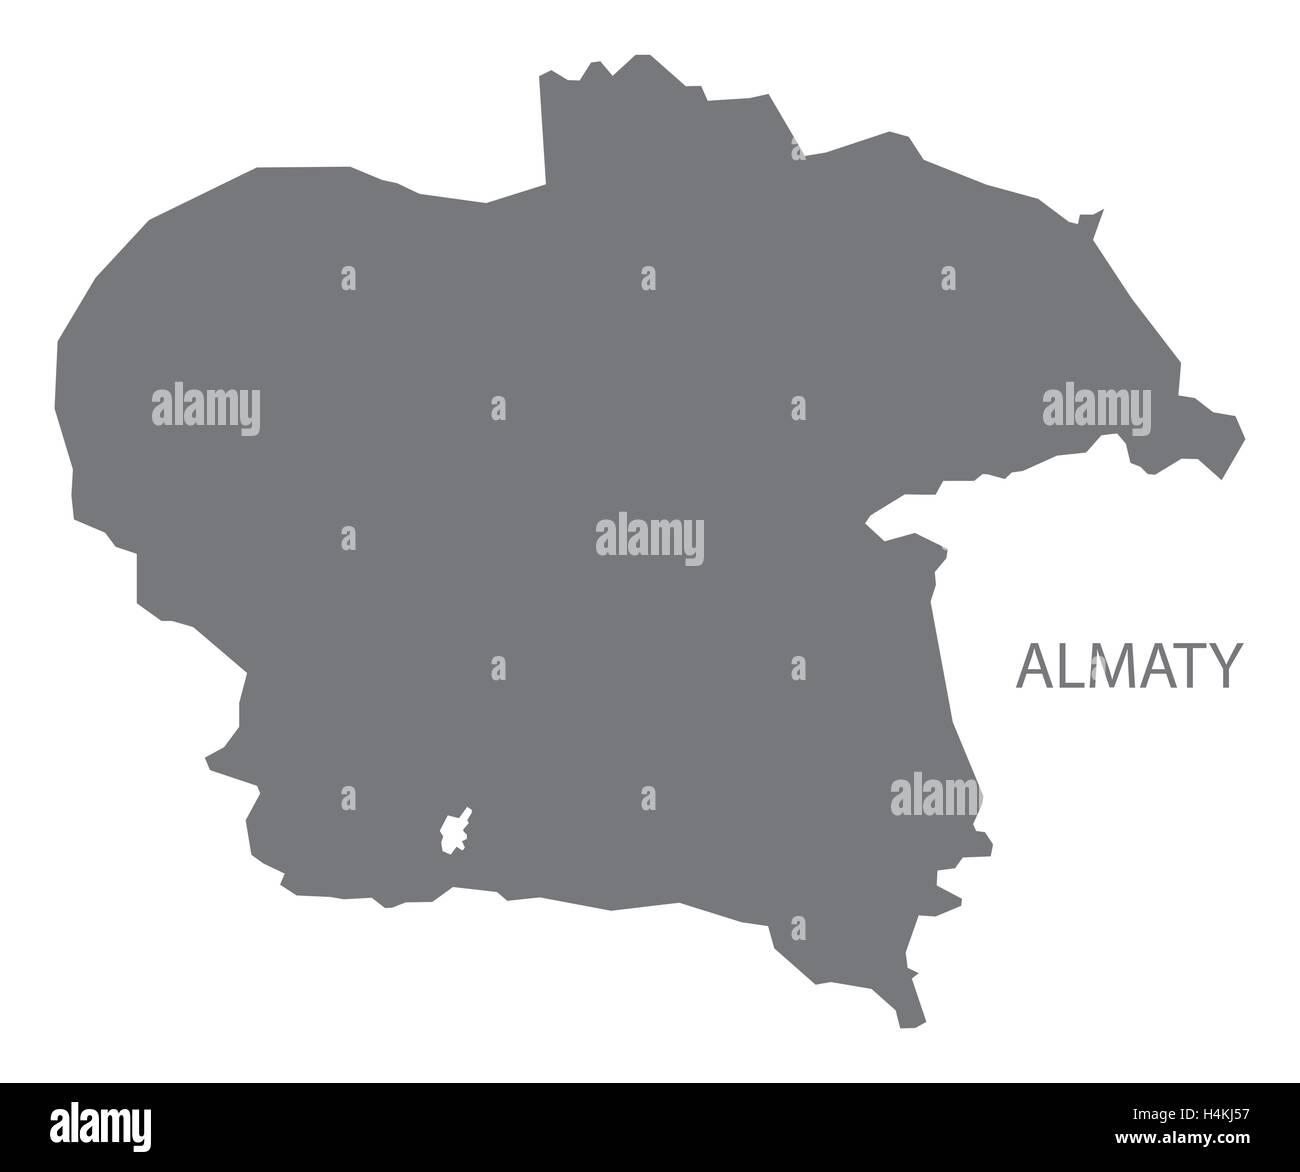 Almaty Kazakhstan Map Grey Stock Vector Art Illustration Vector